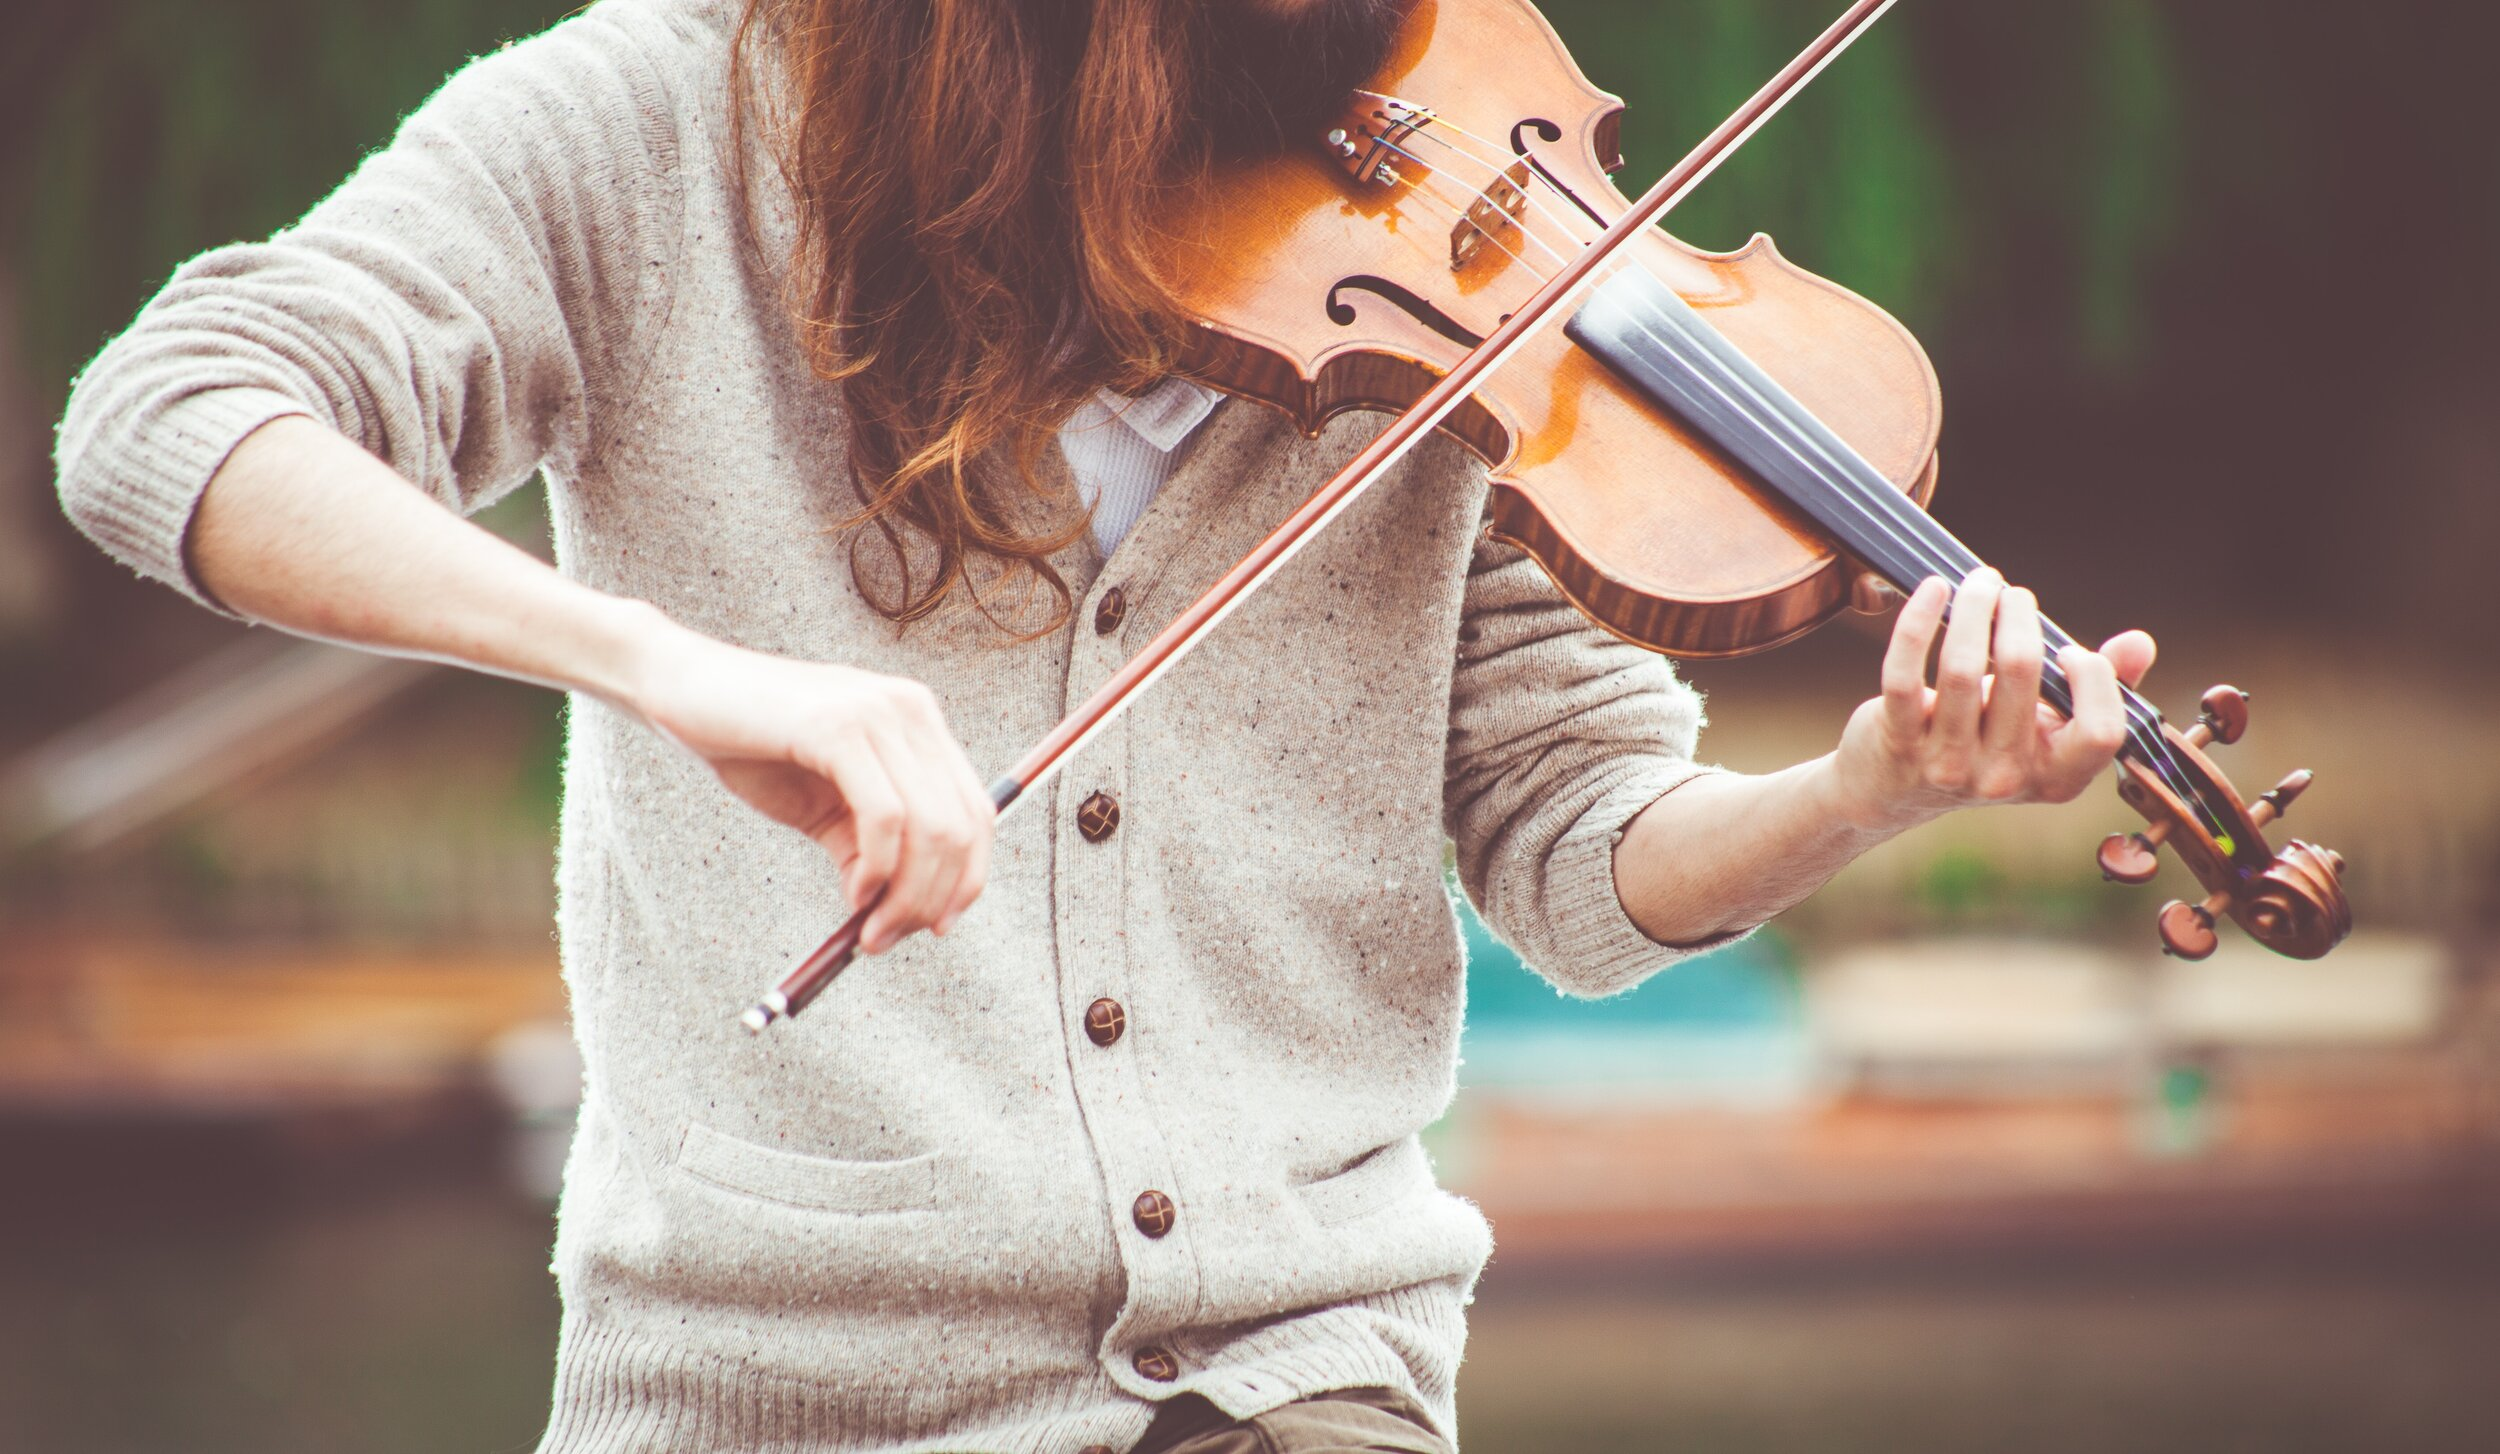 concert-music-musical-instrument-111287.jpg